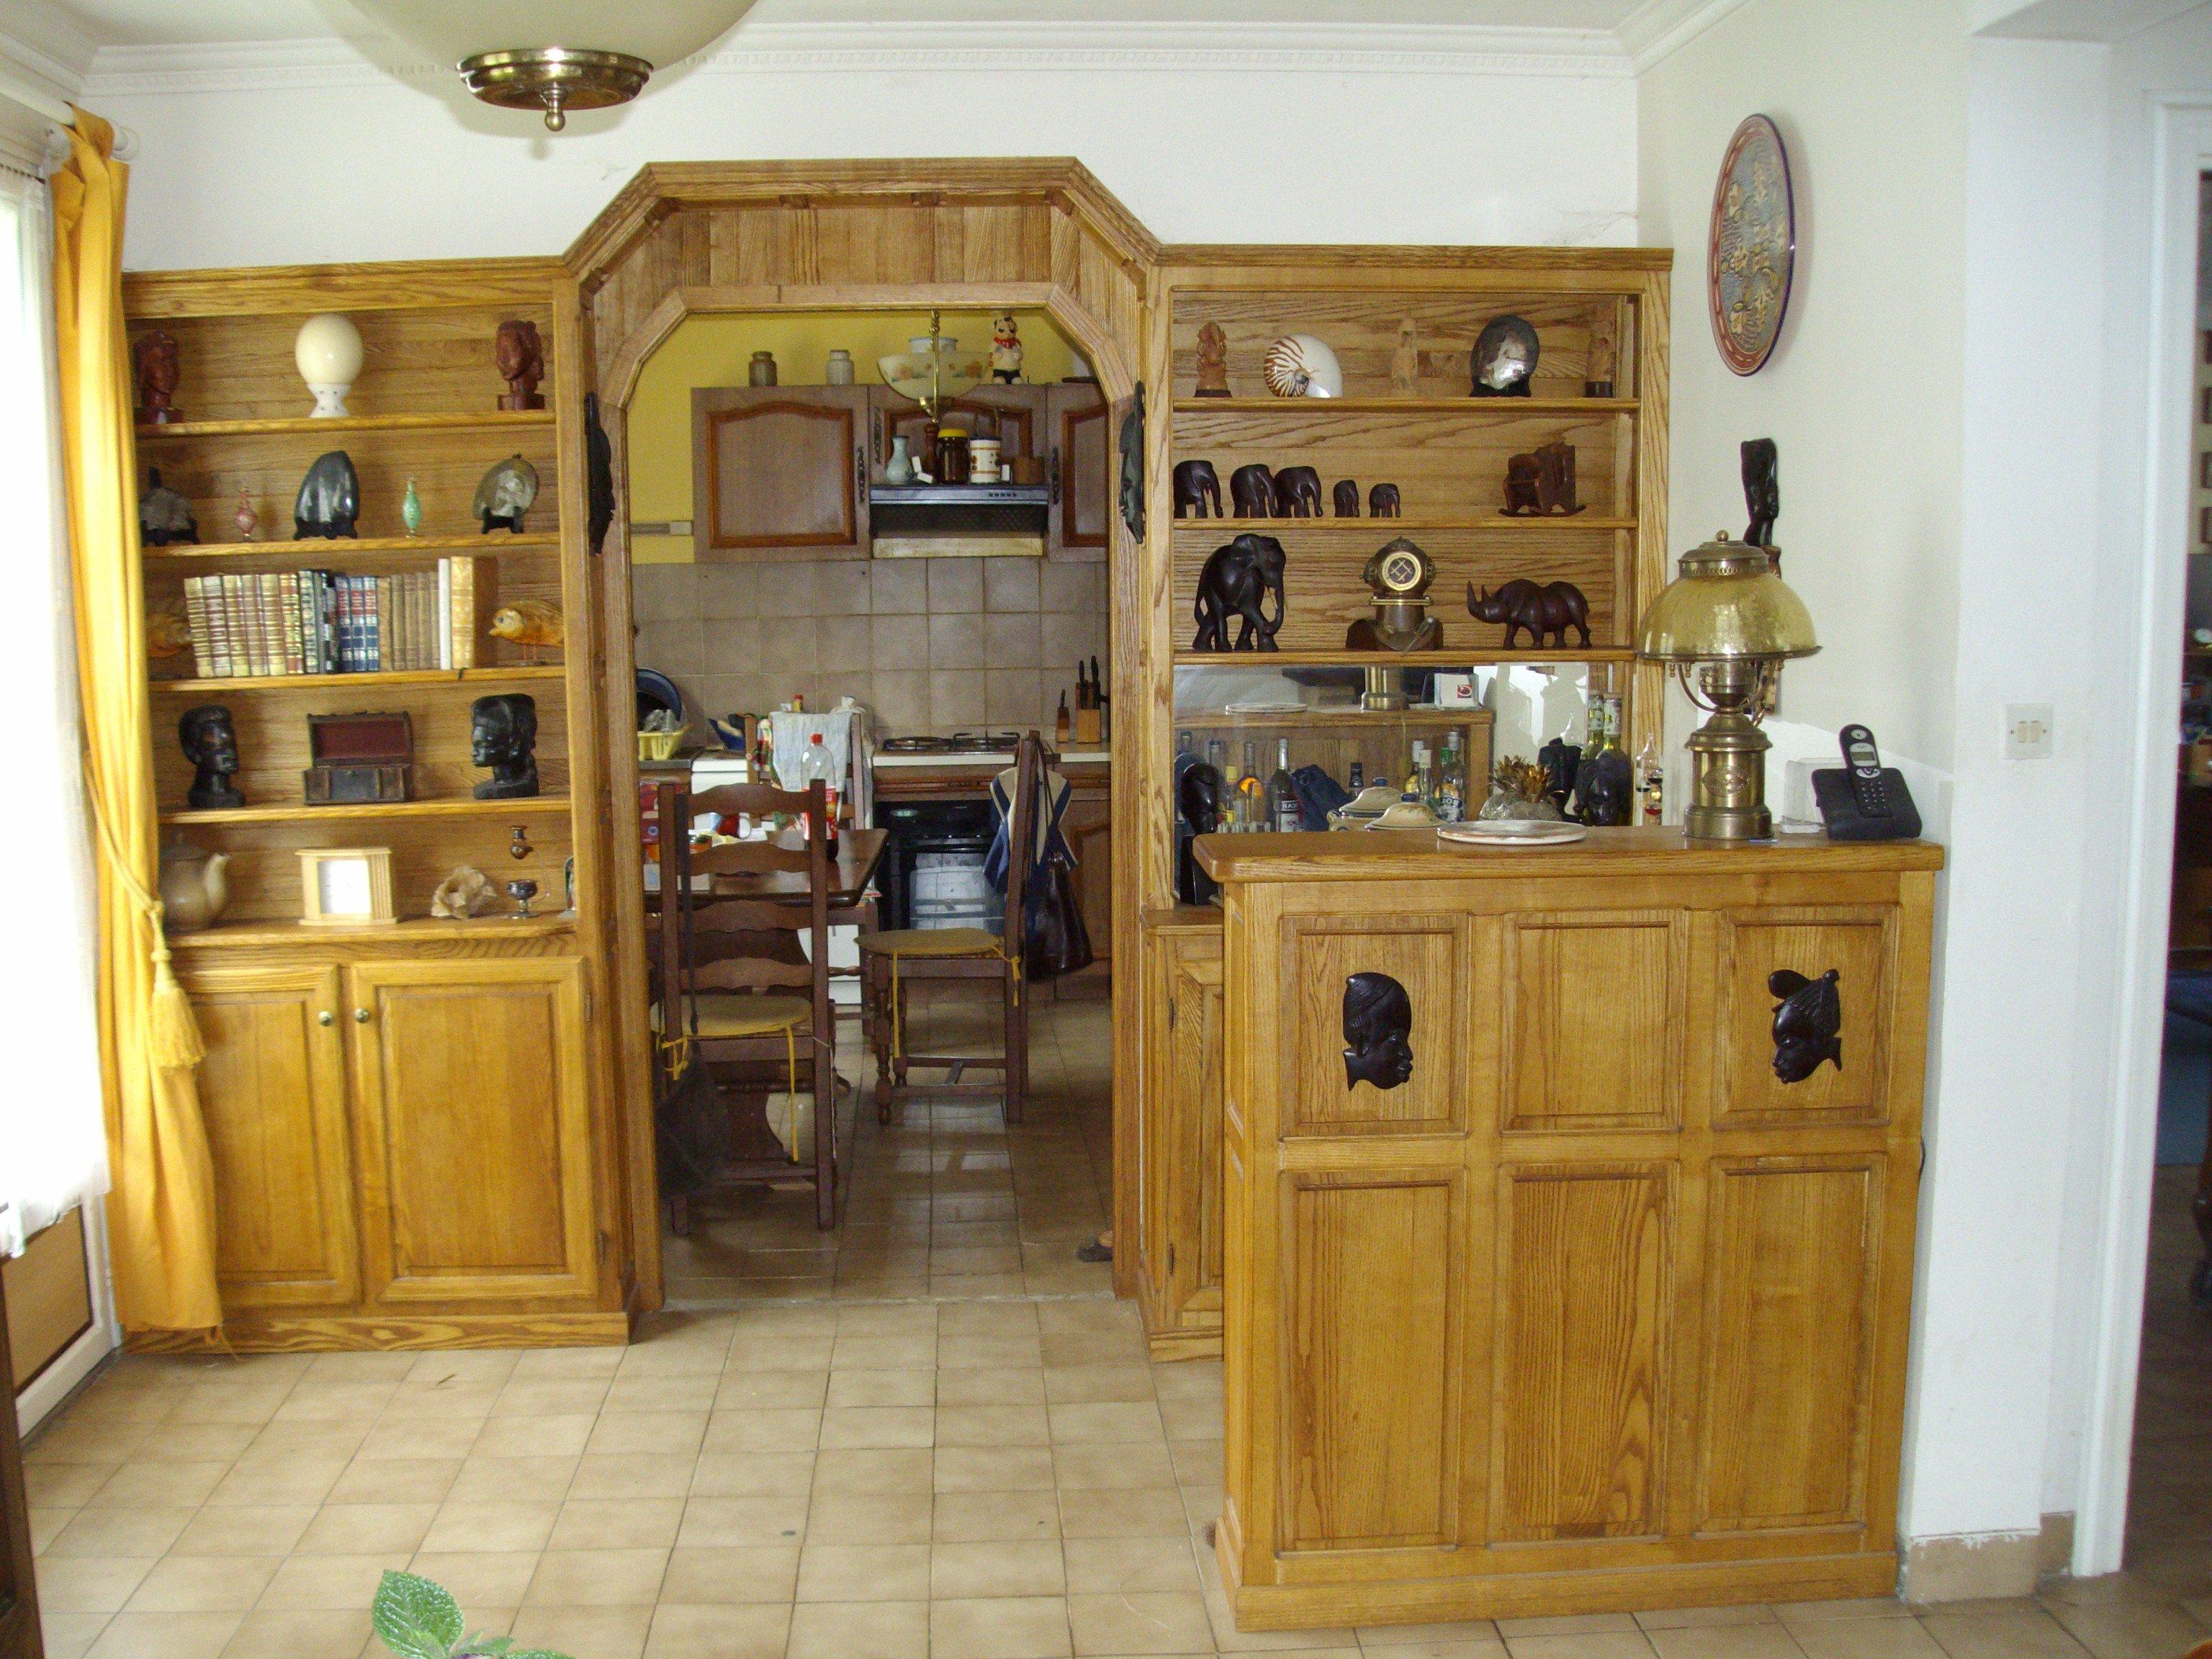 mur biblioth que avec porte int gr e aegm menuiserie. Black Bedroom Furniture Sets. Home Design Ideas